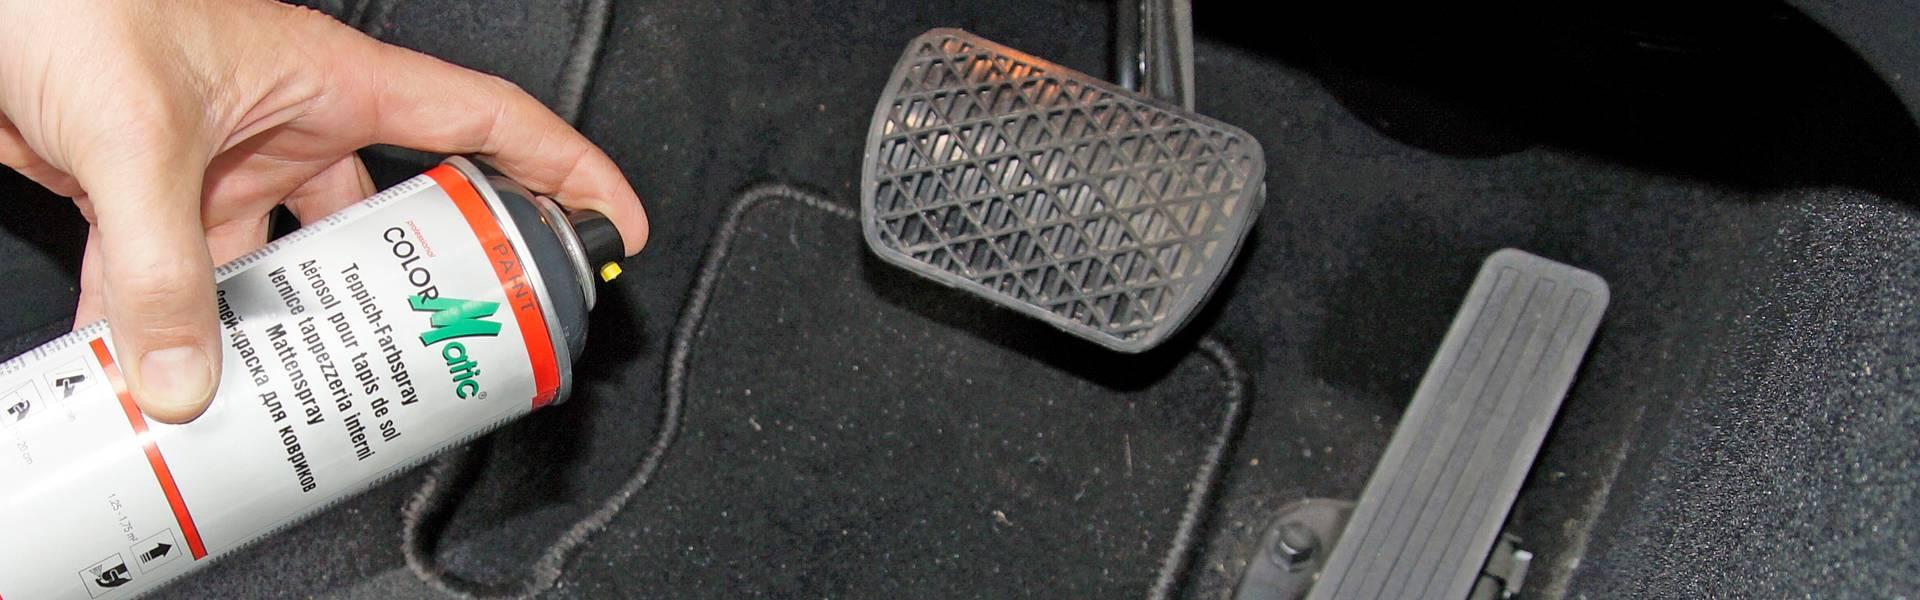 Colour refresh for car mats   Co. ed0606014aa